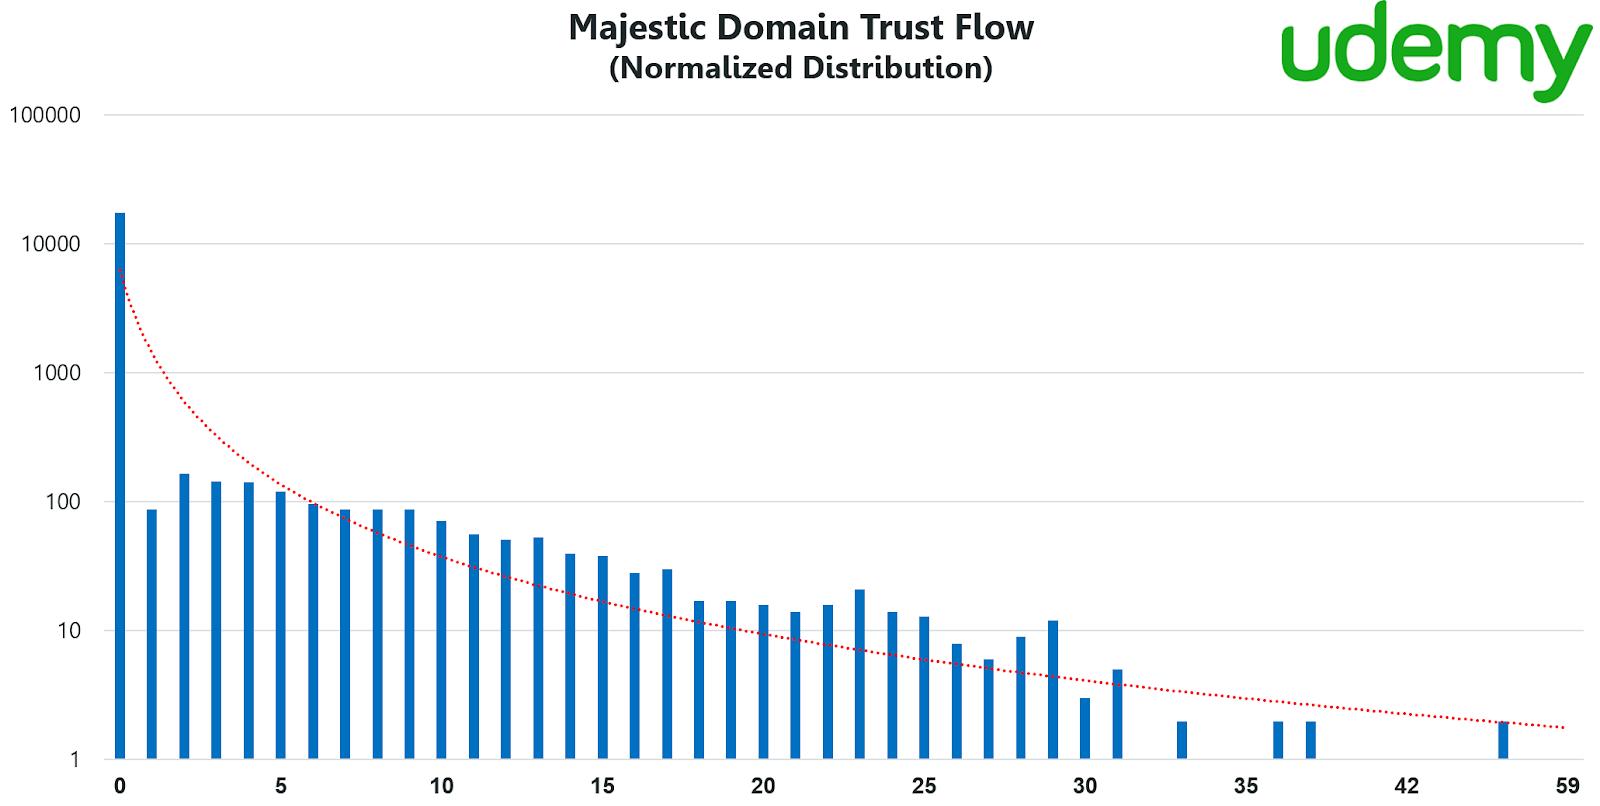 Majestic domain trust flow